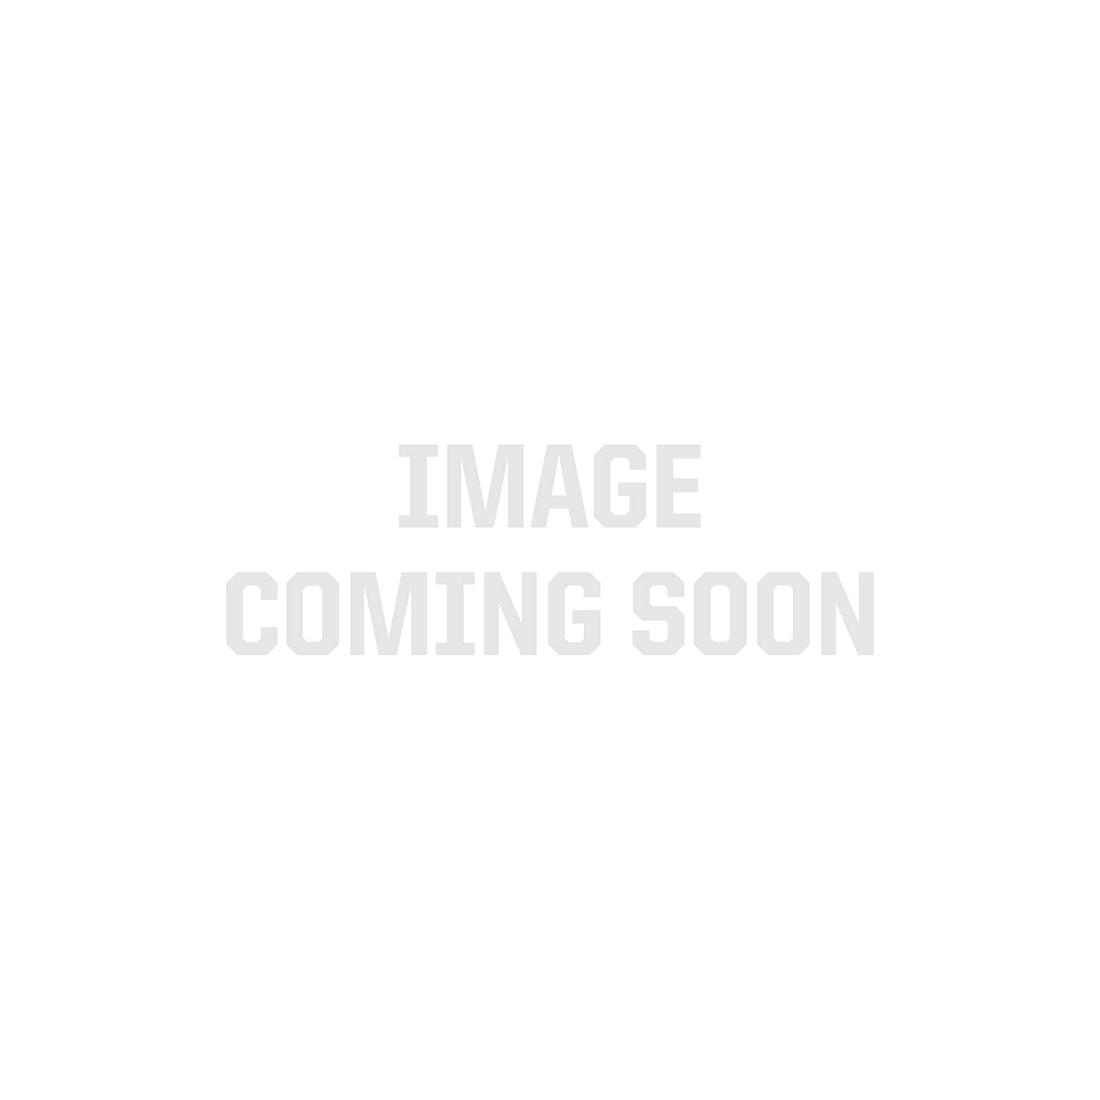 HyperFlex 2835 LED Strip Light - Green - 60/m - CurrentControl - Foot